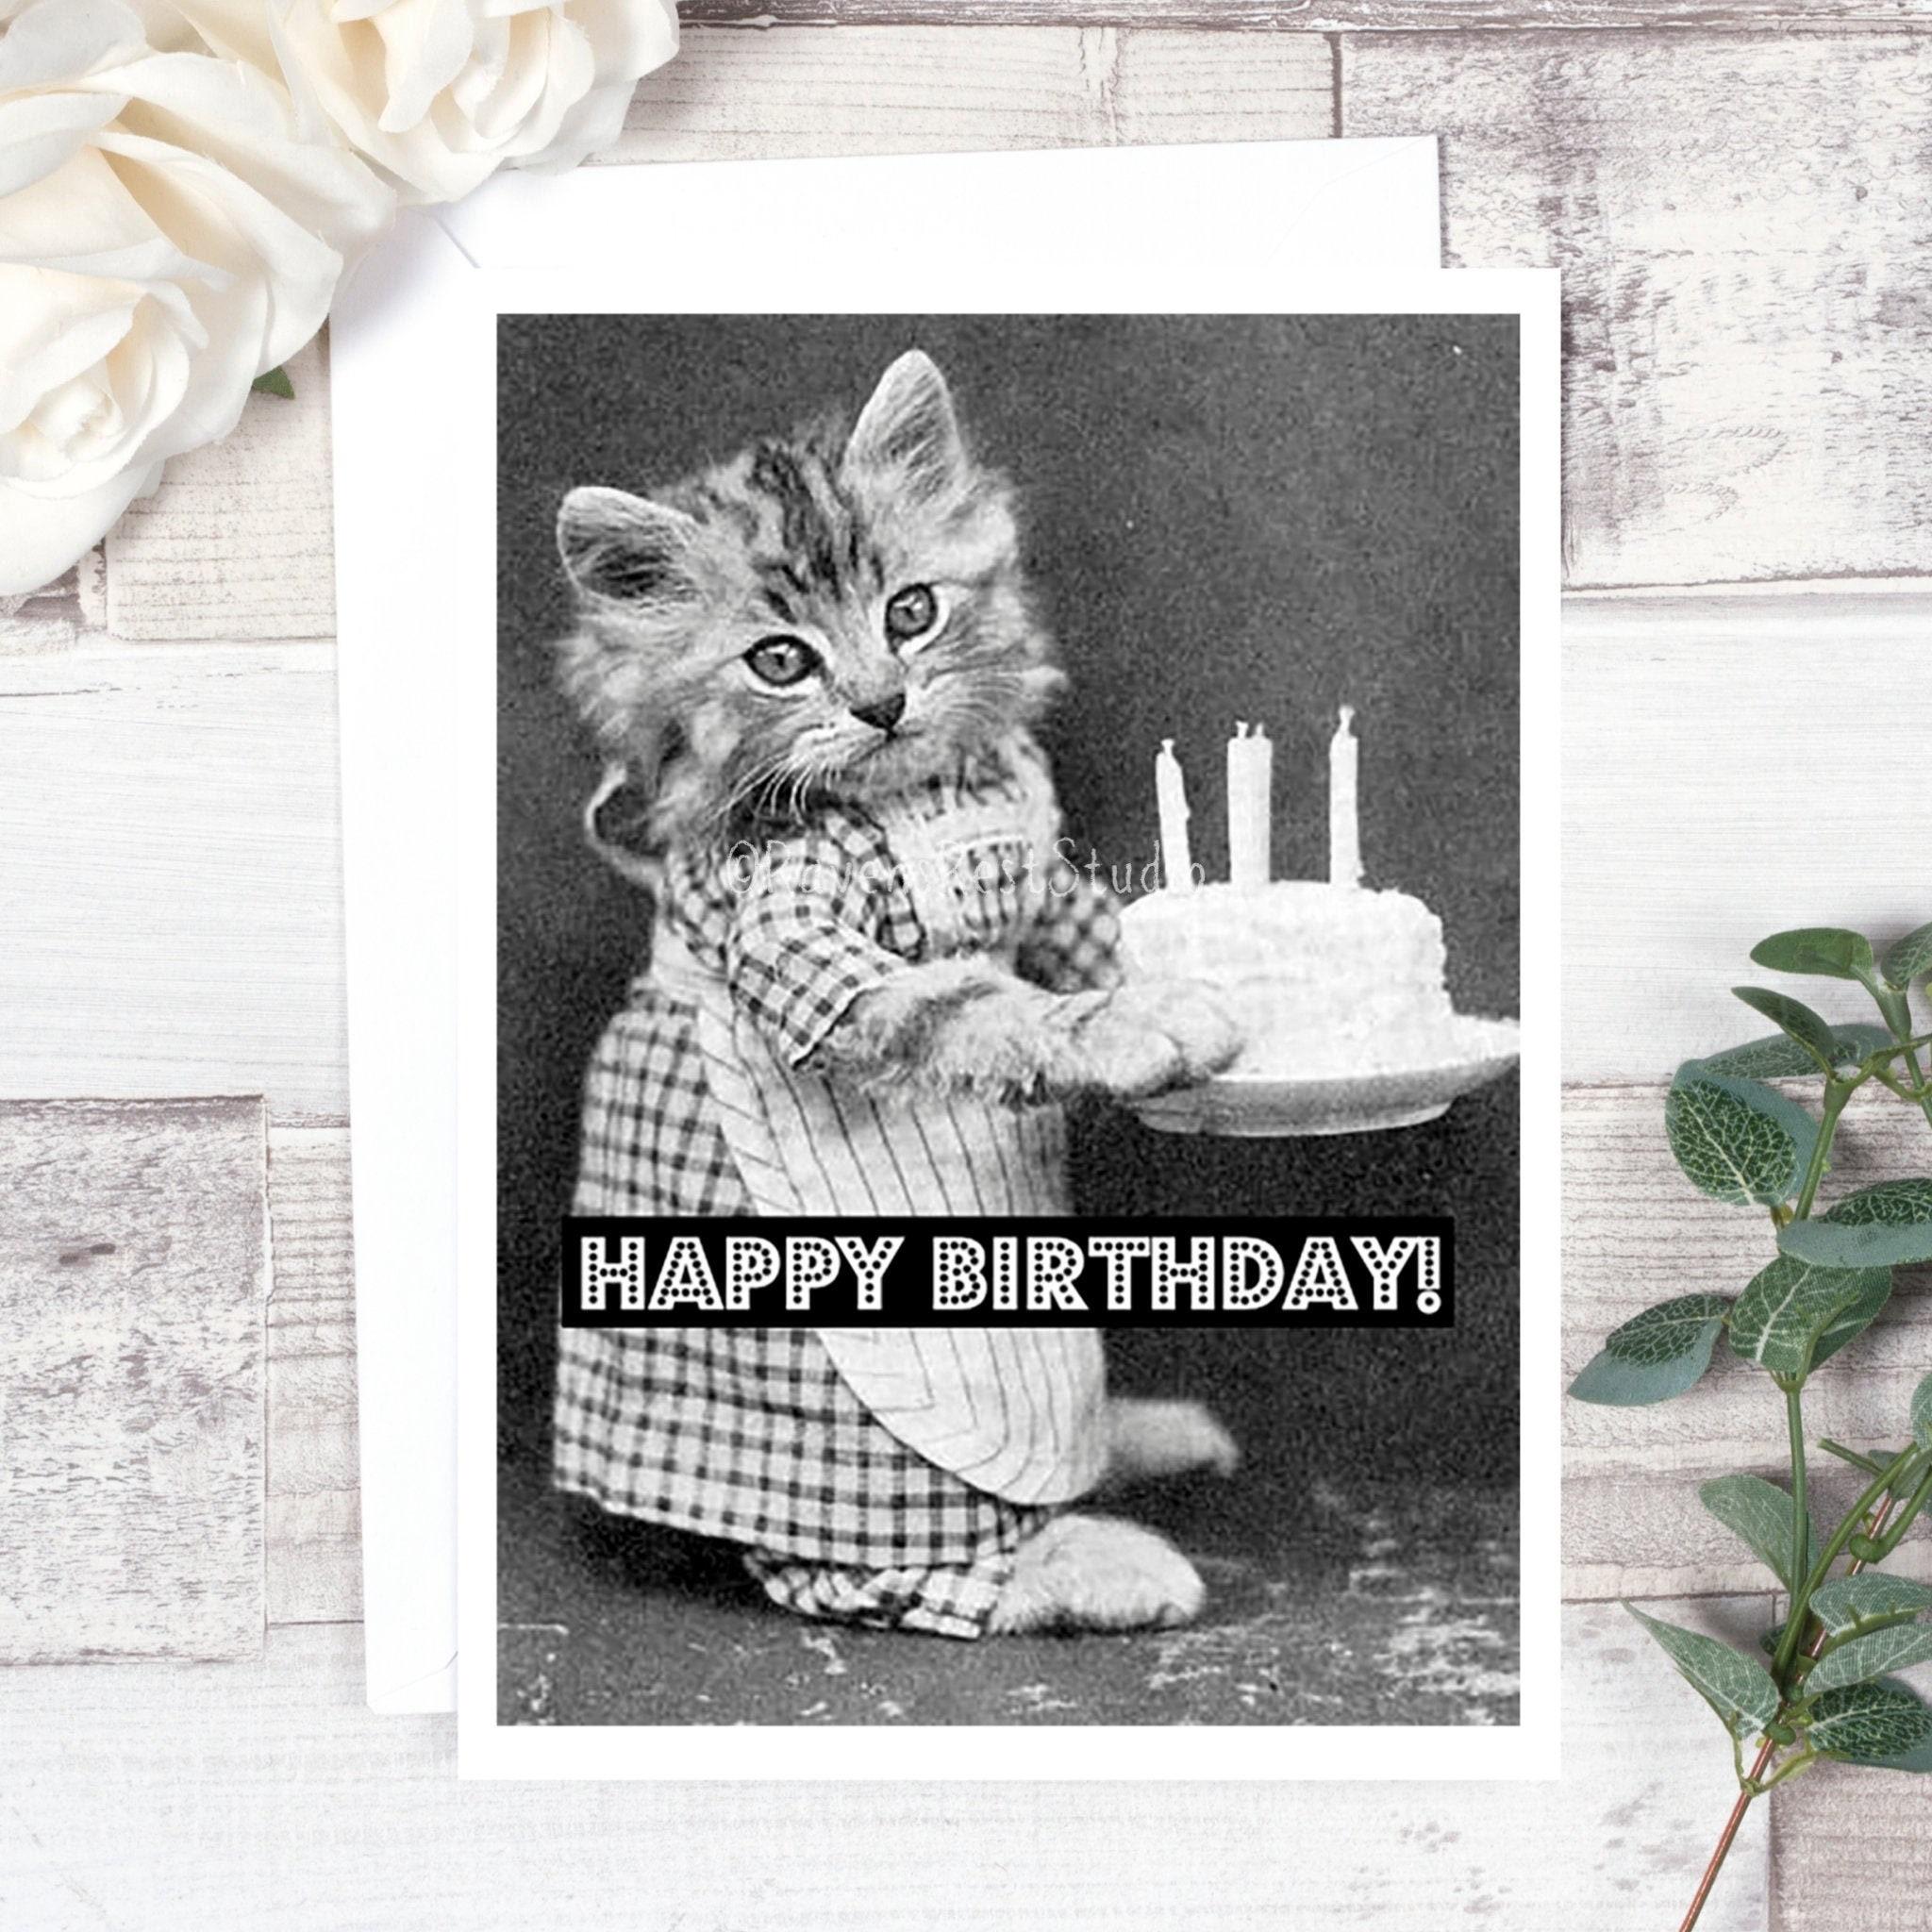 Magnificent Card 68 Birthday Card Happy Birthday Vintage Photo Card Cat Funny Birthday Cards Online Elaedamsfinfo